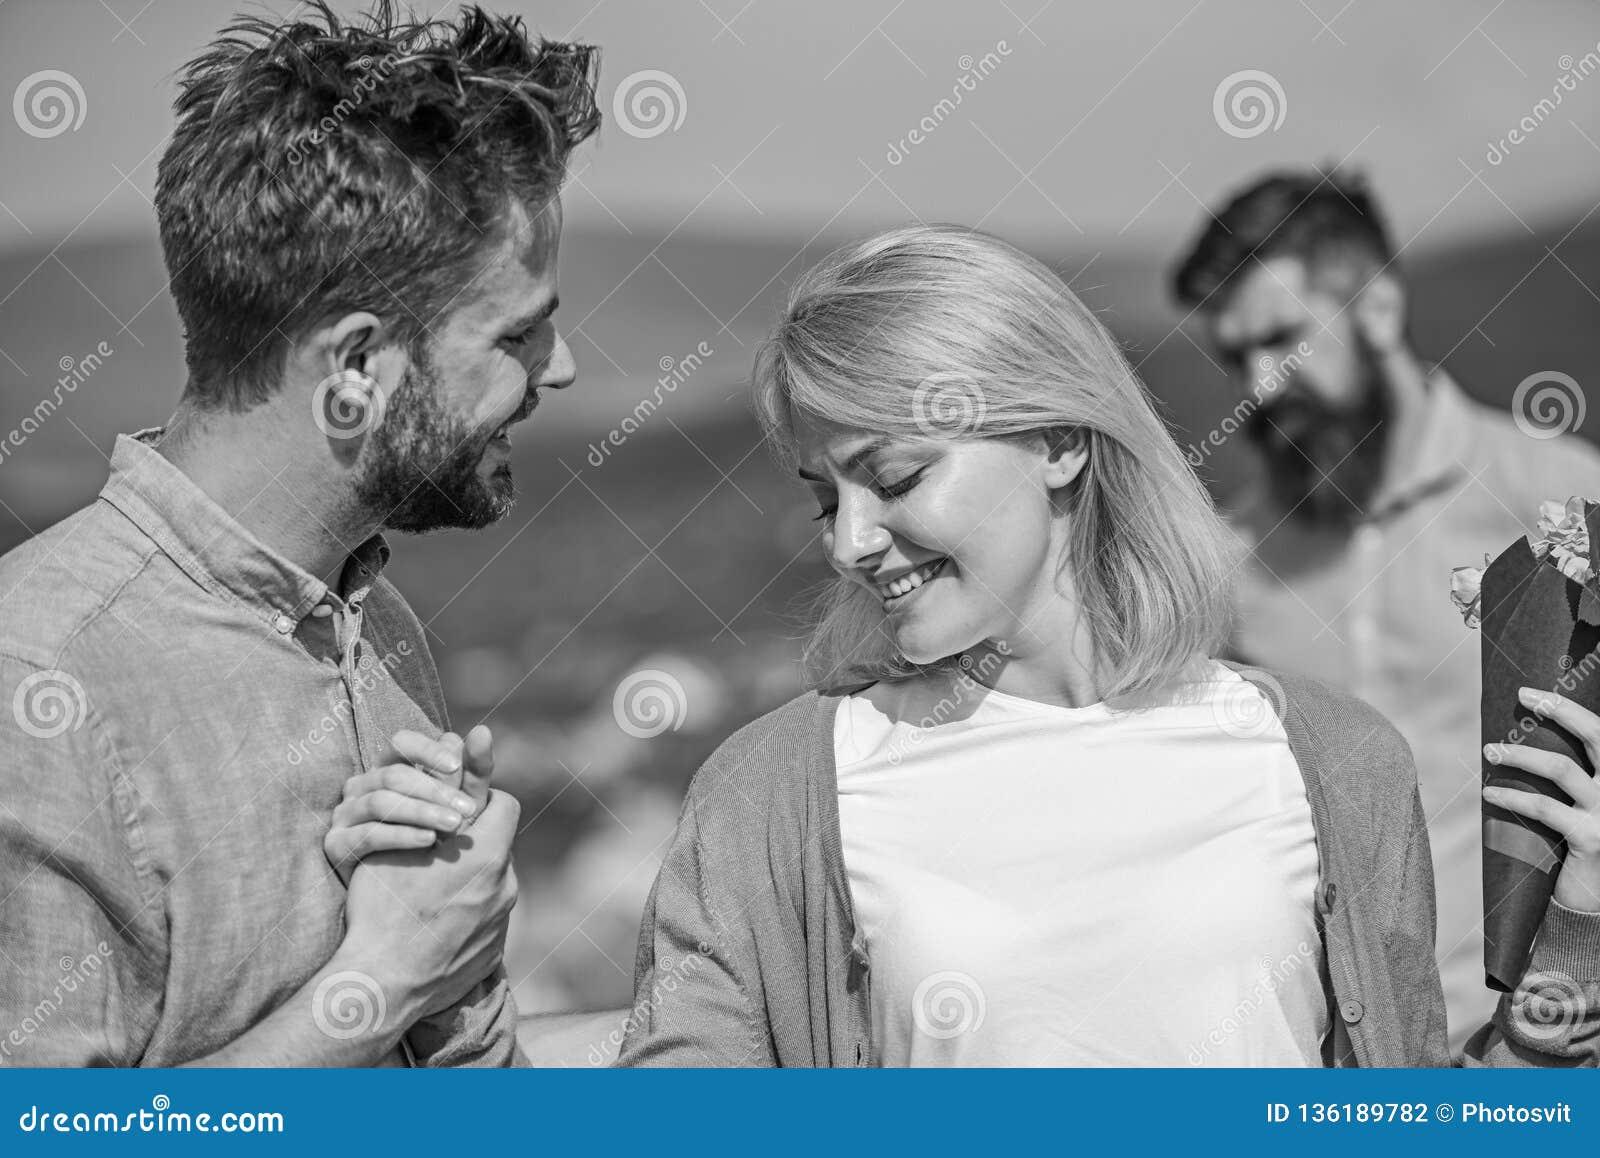 Couple In Love Happy Dating, Jealous Bearded Man Watching